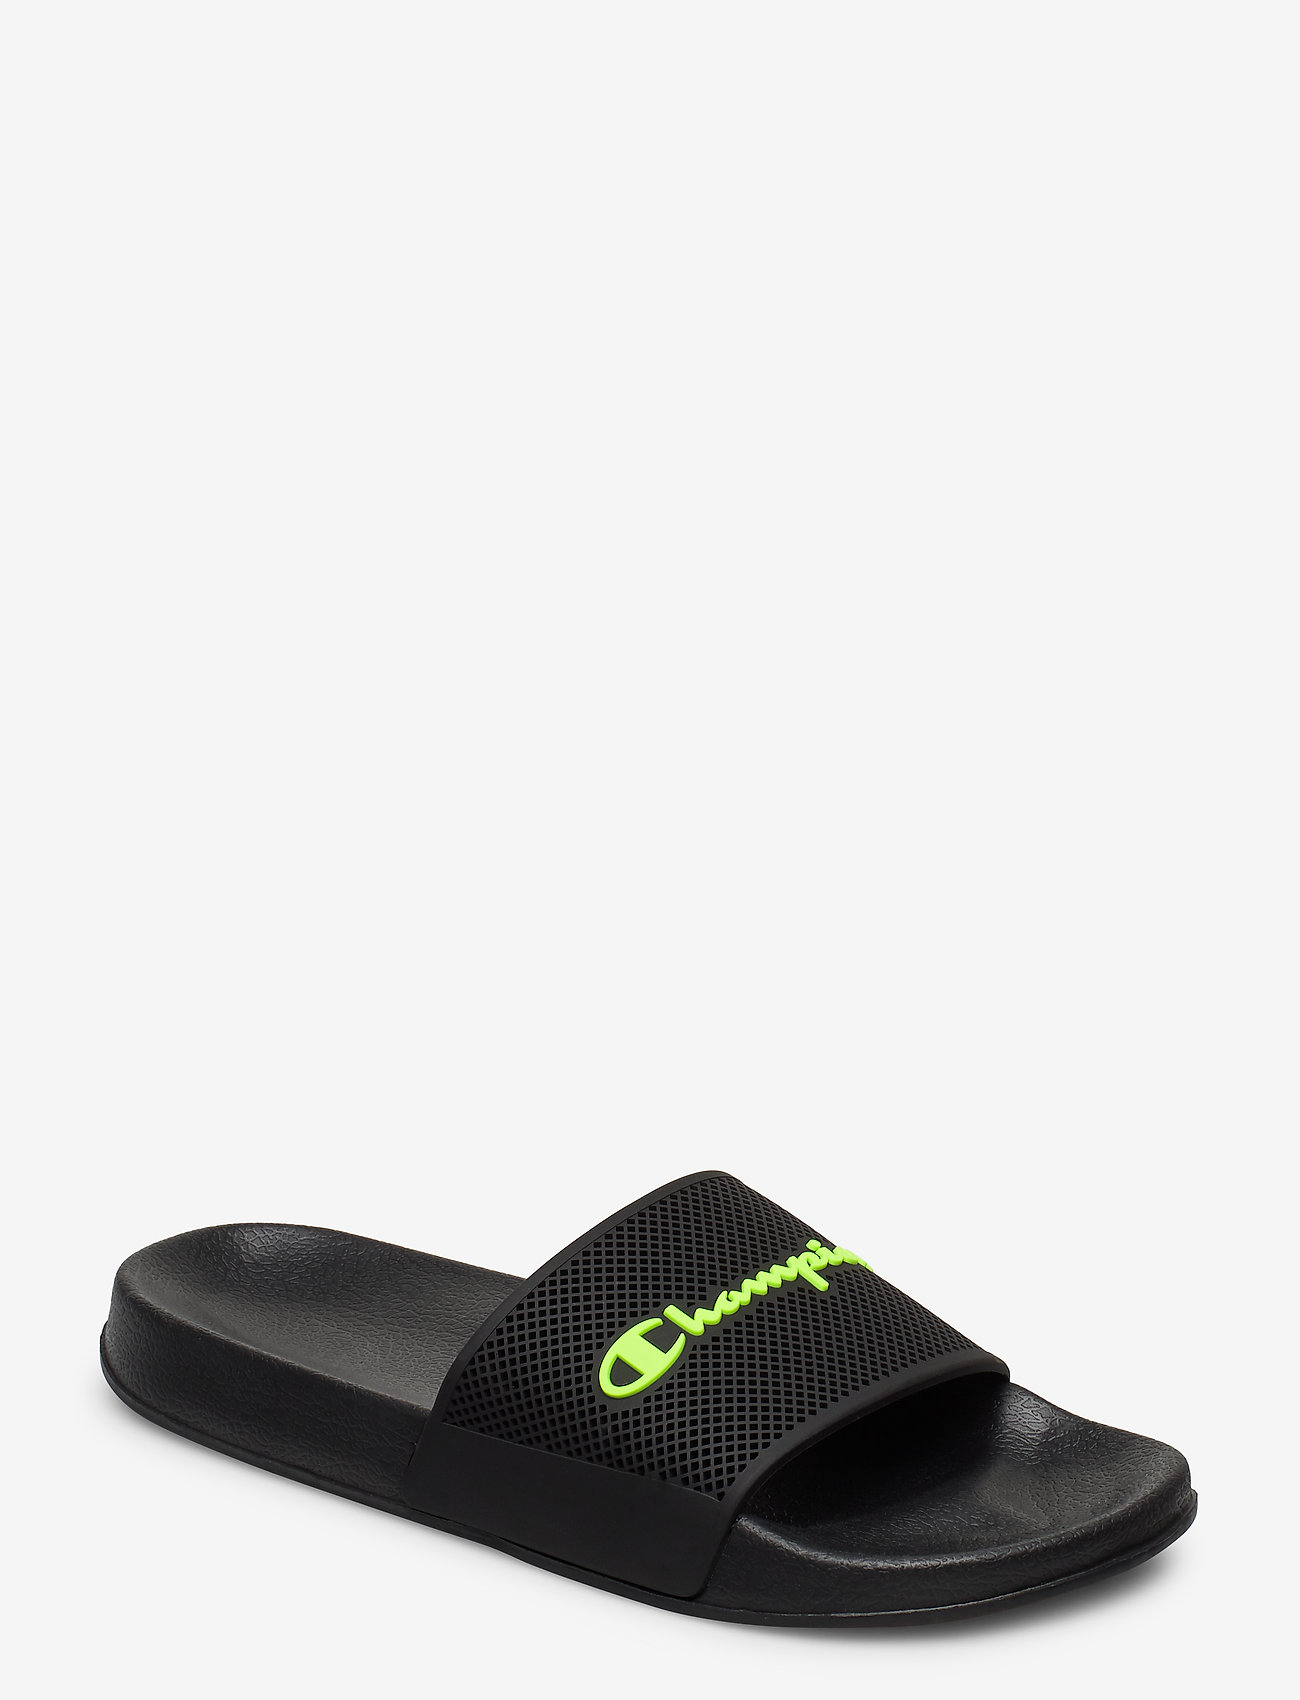 Champion - Sandal DAYTONA - pool sliders - black beauty a - 0